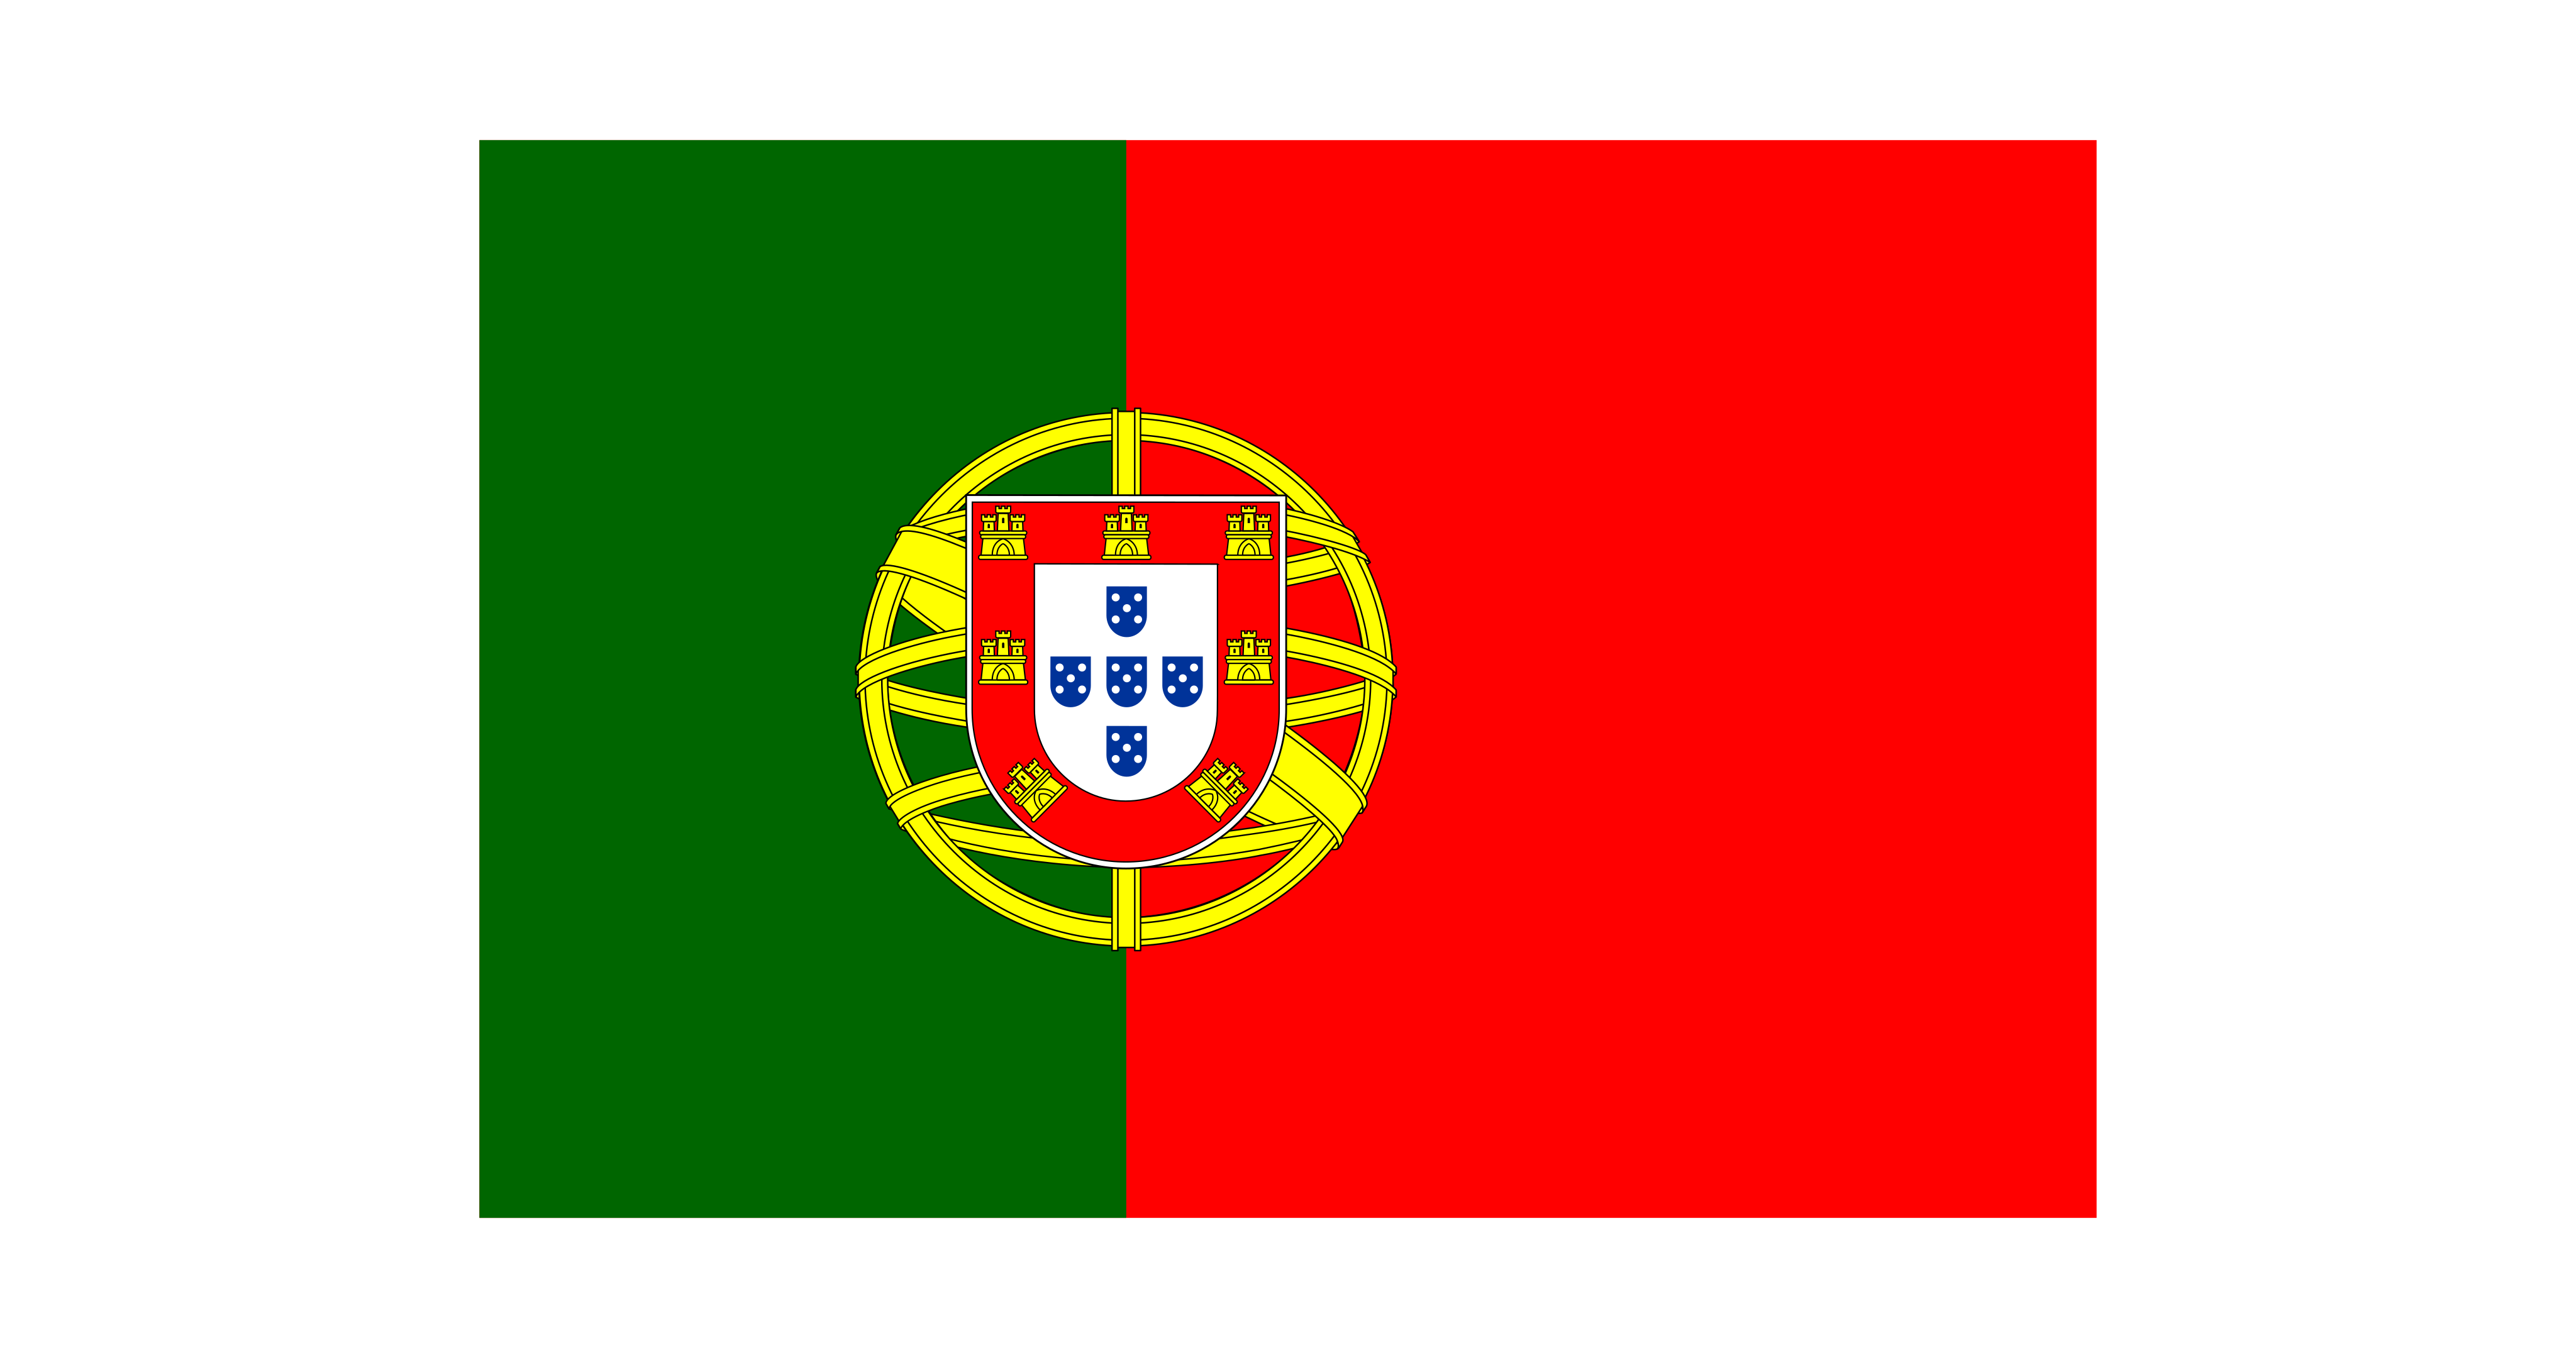 bandeira de portugal 01 - Bandeira de Portugal